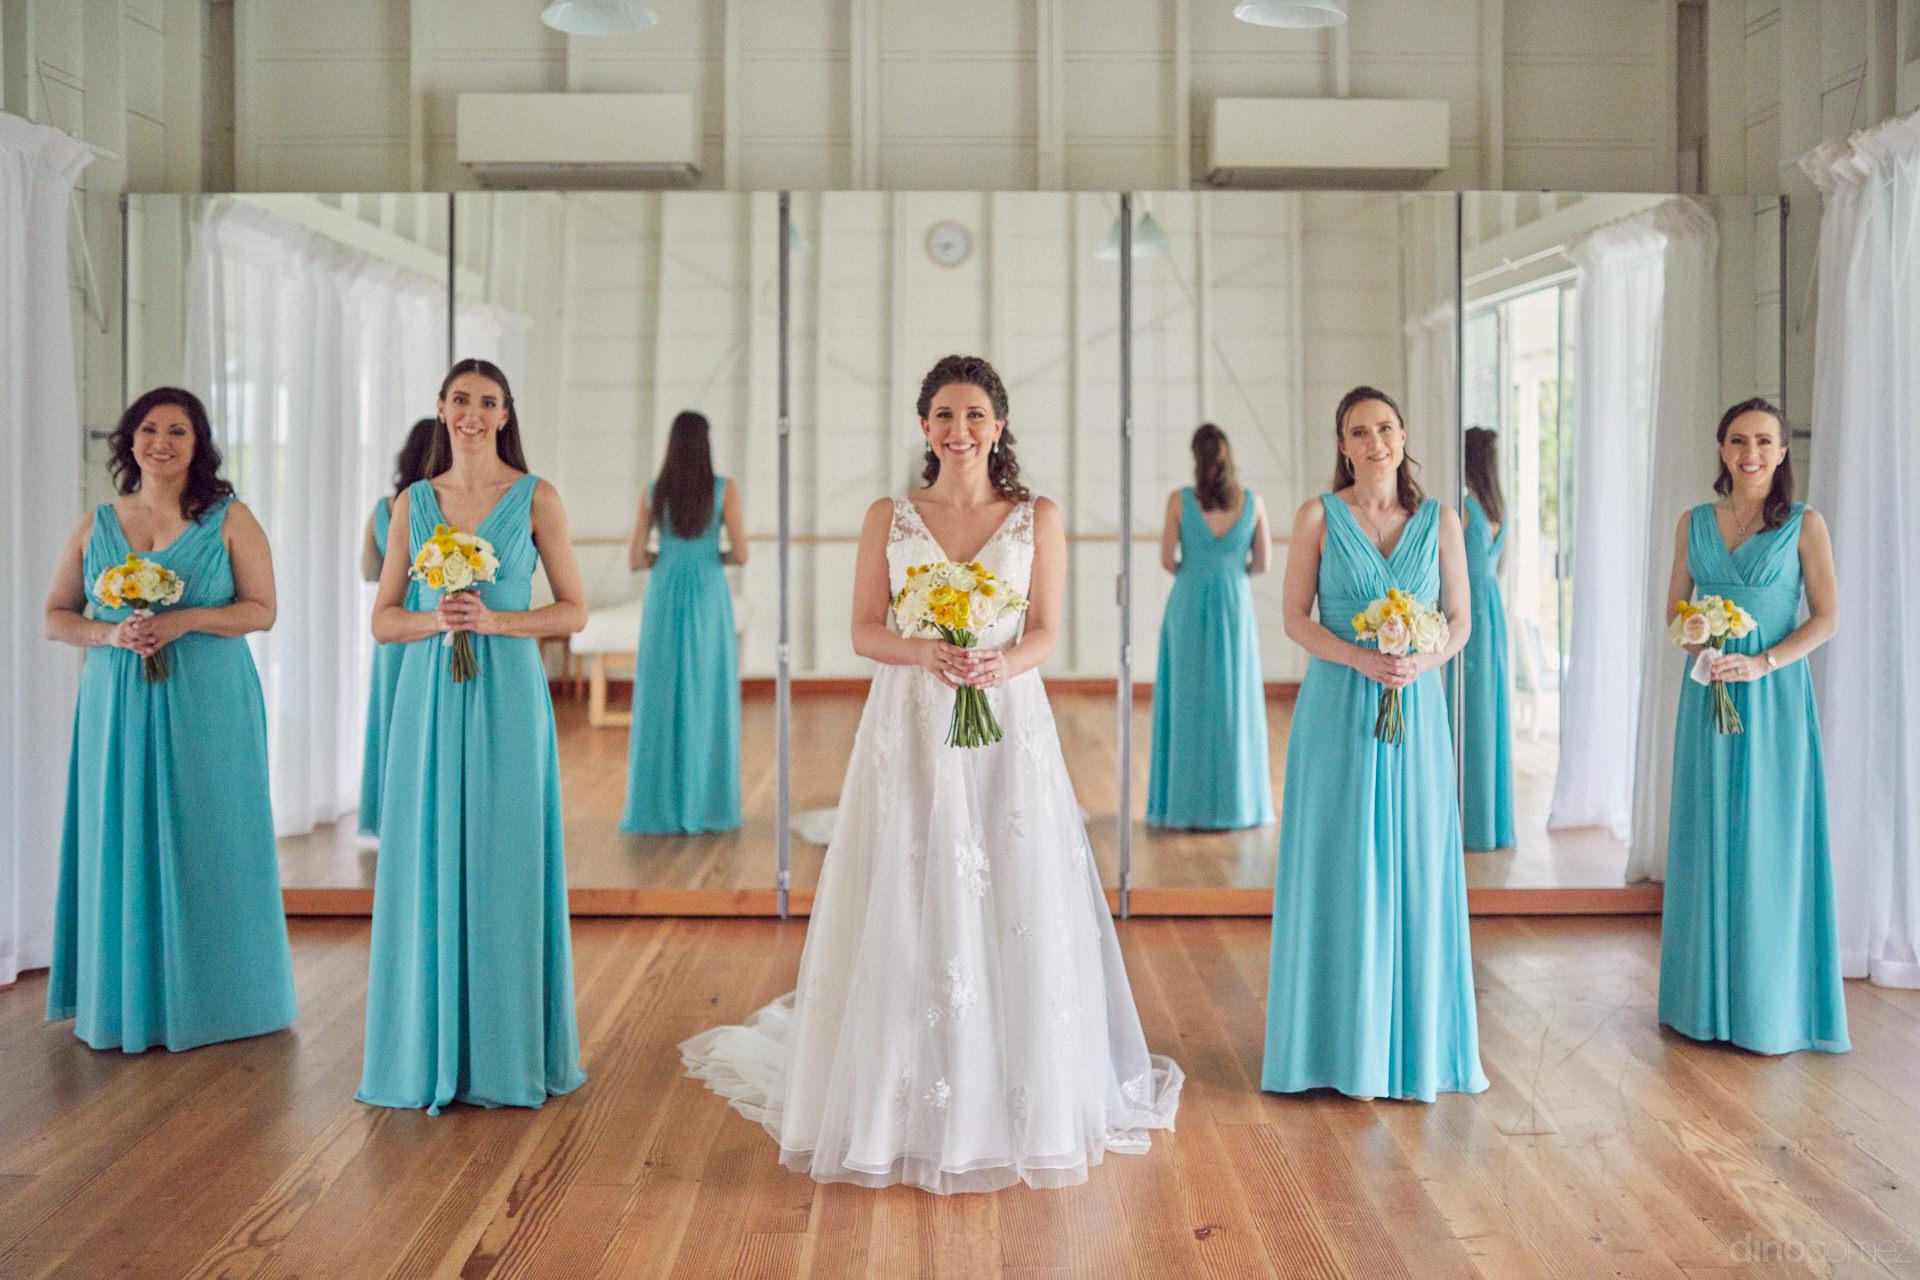 Floras Farm Cabo Destination Wedding Photographers - Hilary & Bryan Flora Wedding